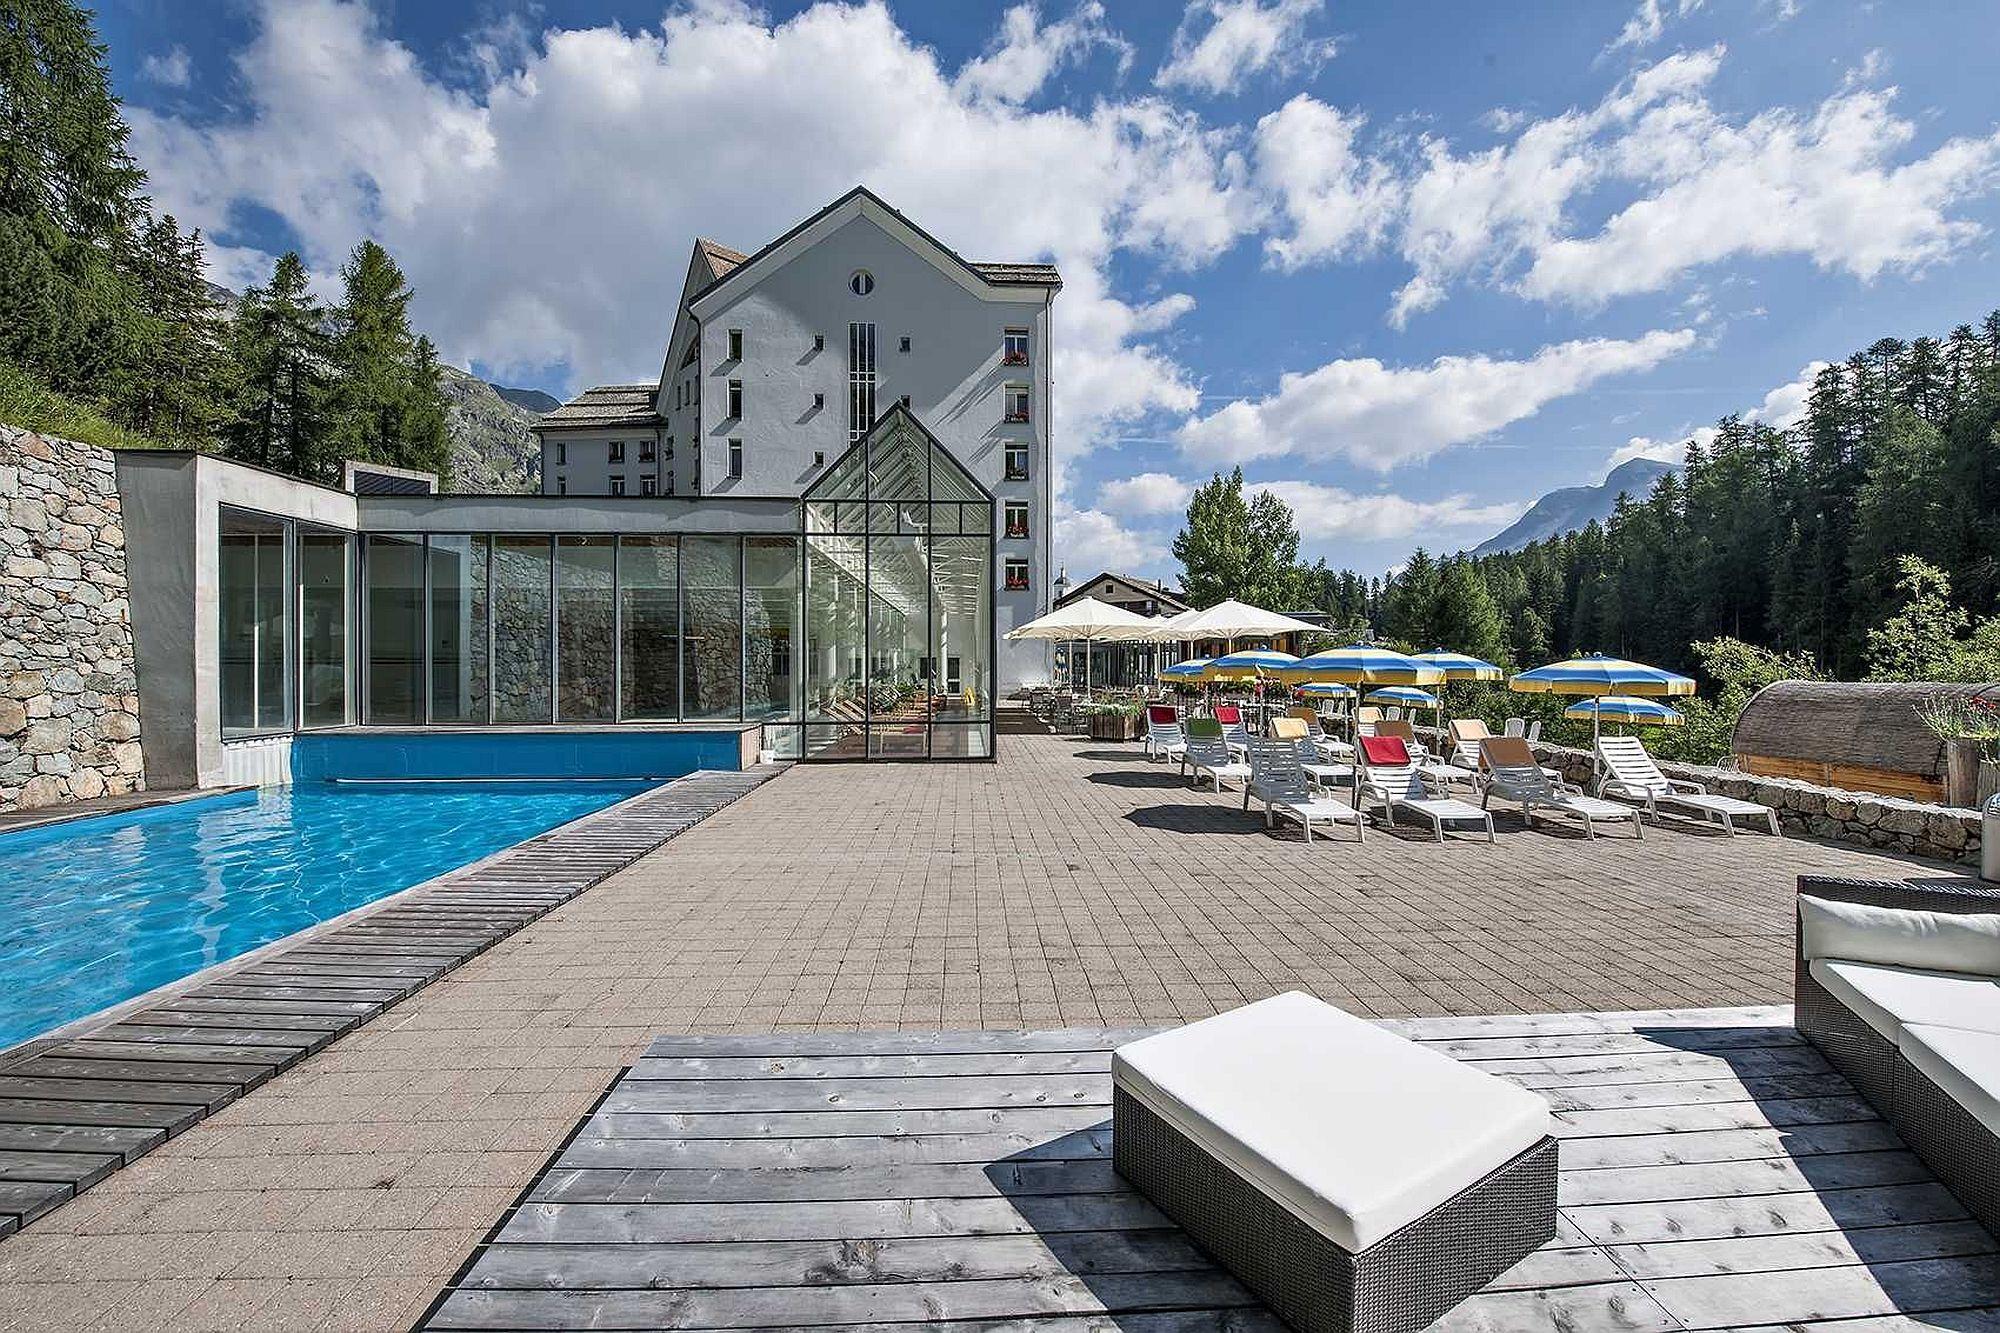 Arenas Resort Schweizerhof (Wellness) Slide 2